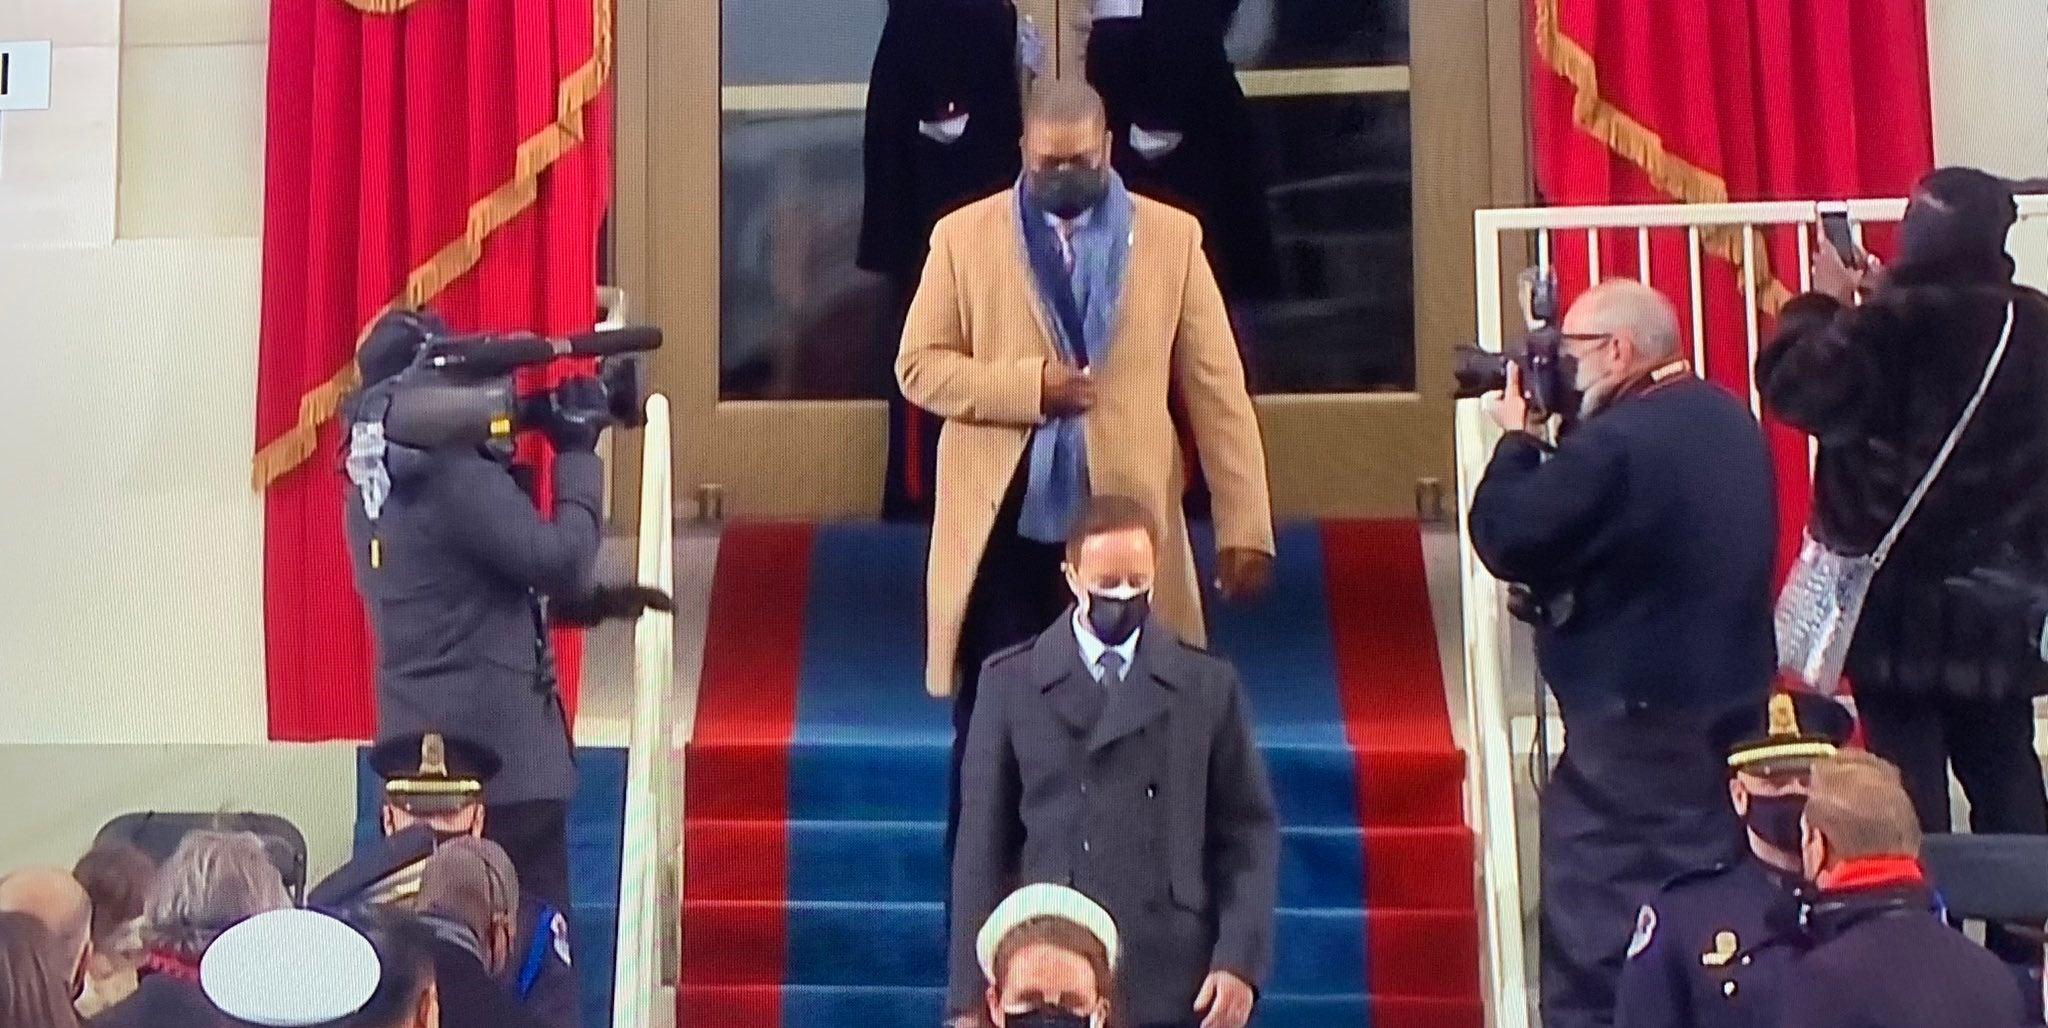 Eugene Goodman assigned as escort to Vice President Kamala ...